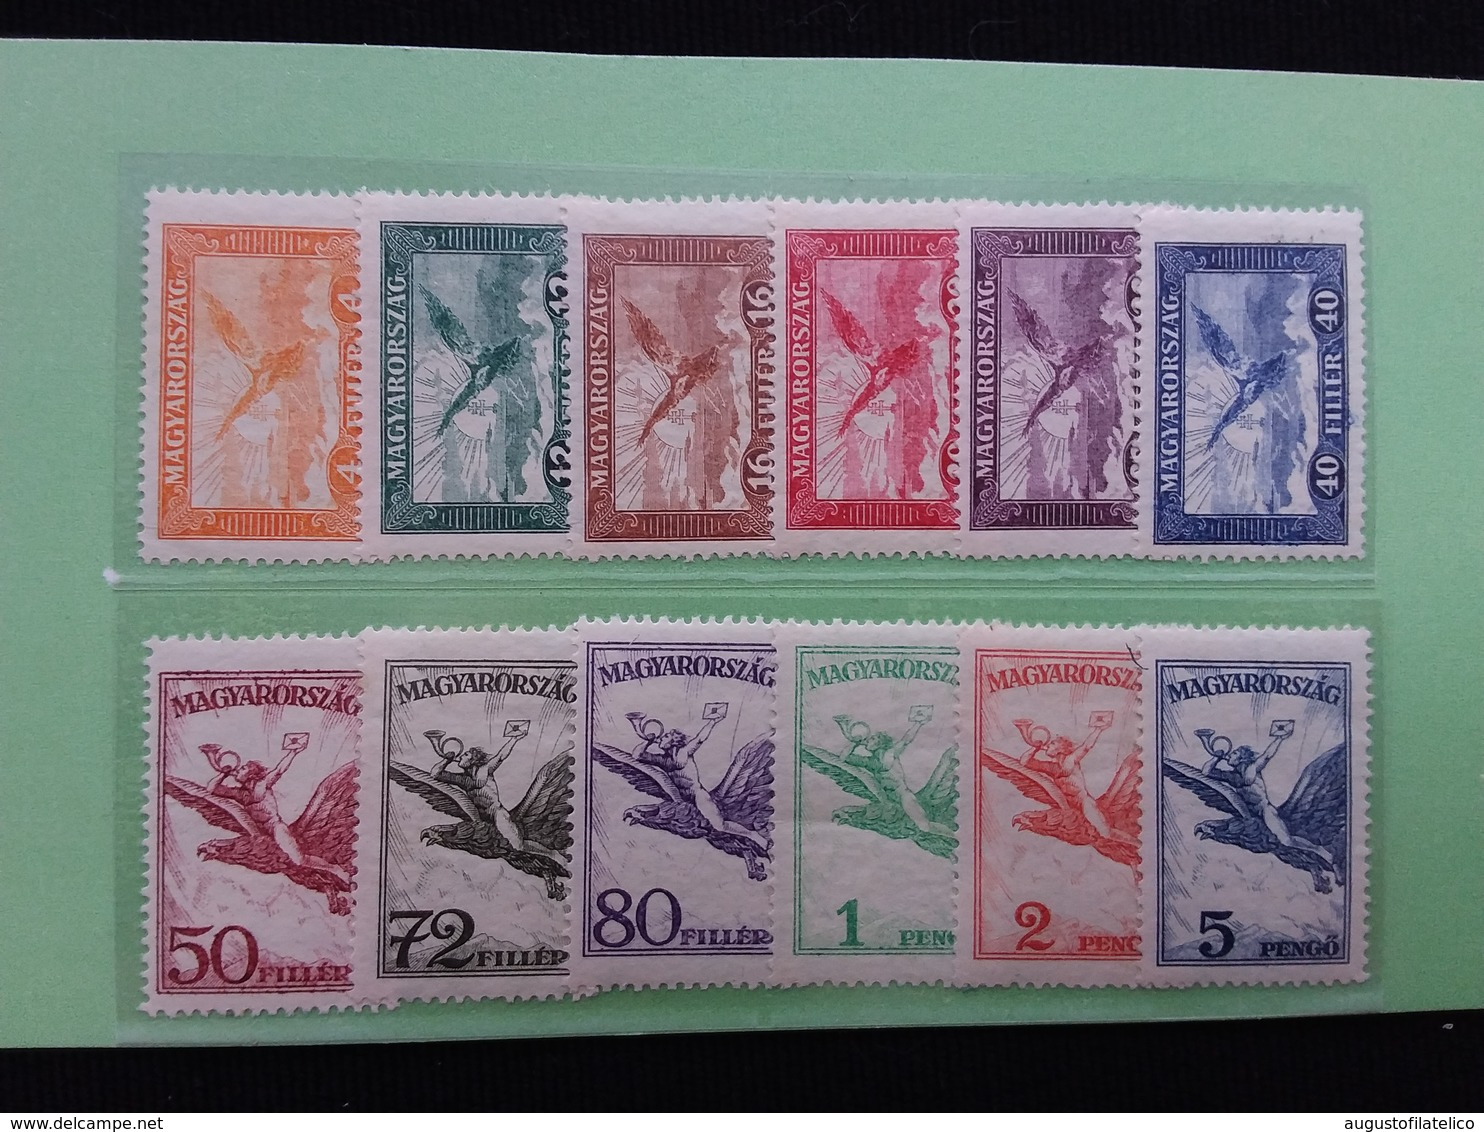 UNGHERIA 1927/30 - Posta Aerea Nn. A12/19 + A20/23 Nuovi * + Spese Postali - Nuovi